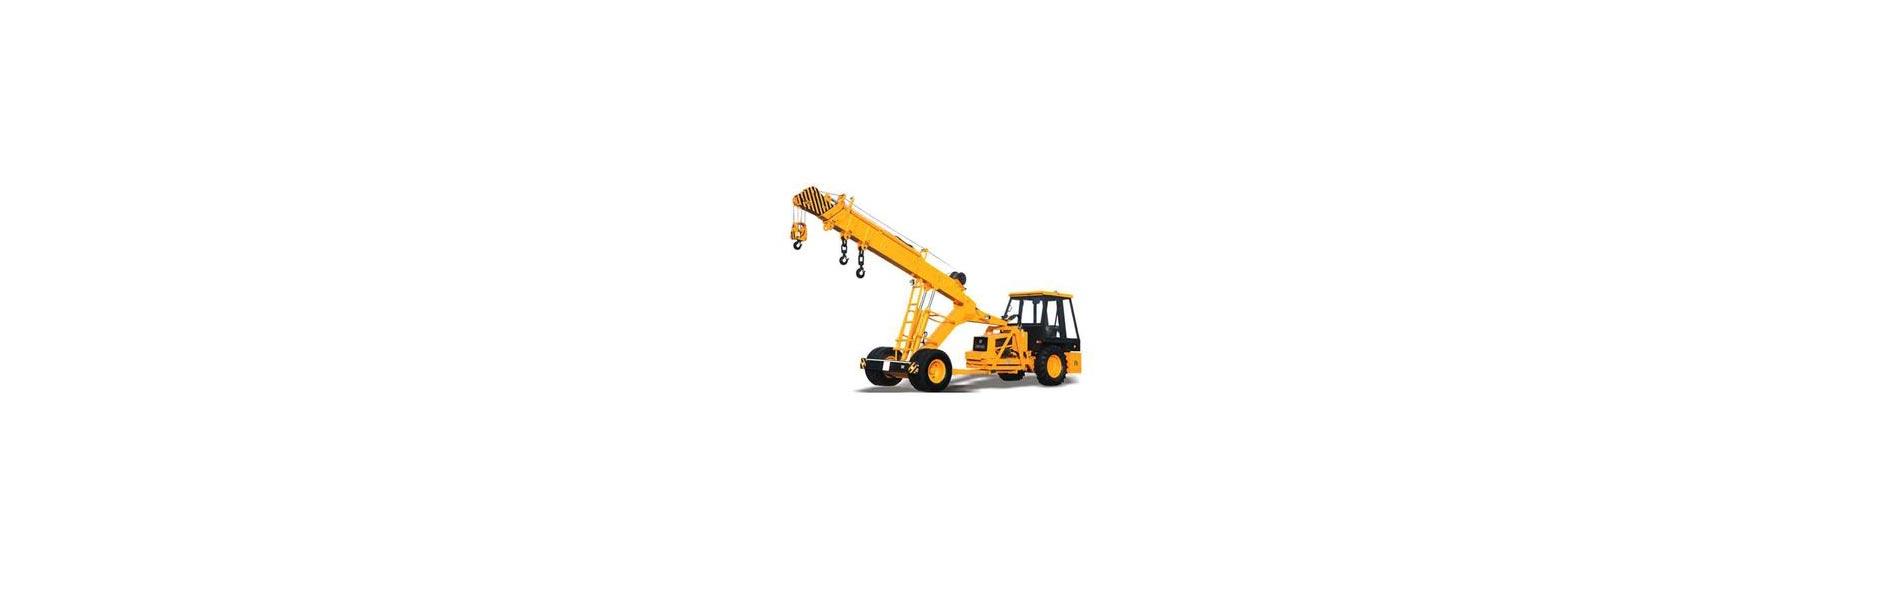 Uttam Construction Equipment